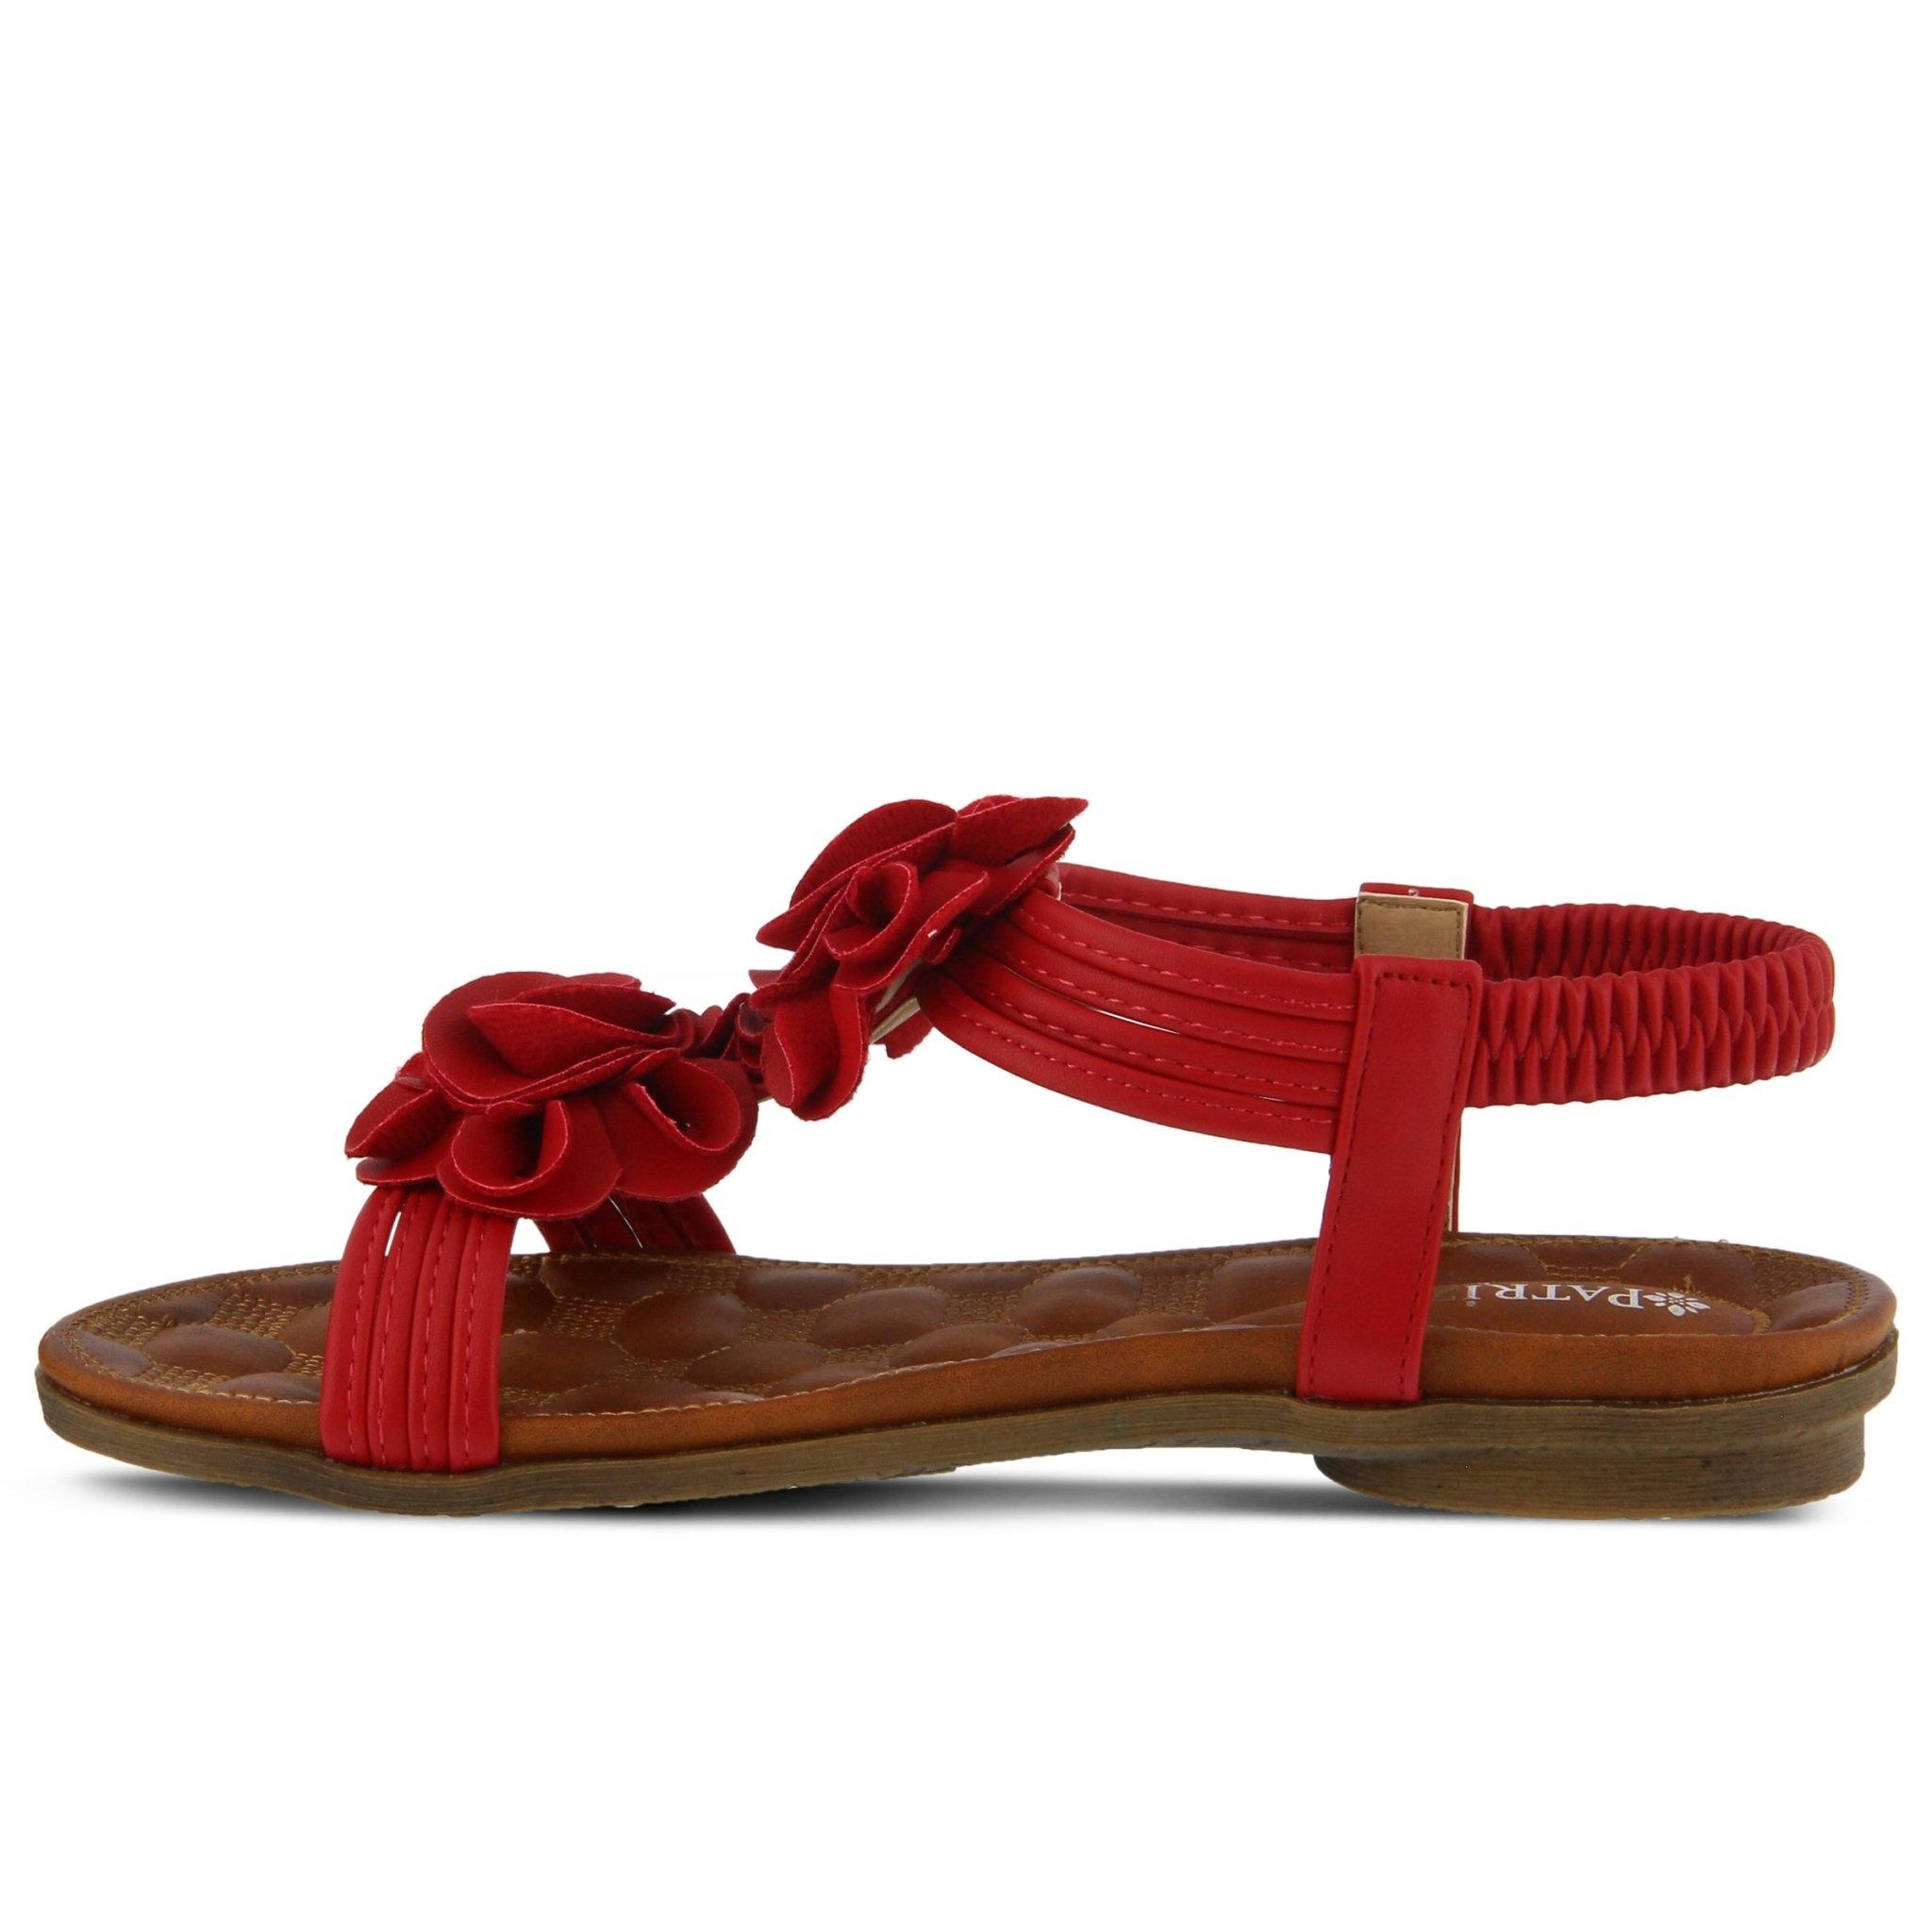 Patrizia Patrizia Nectarine Sandal Red